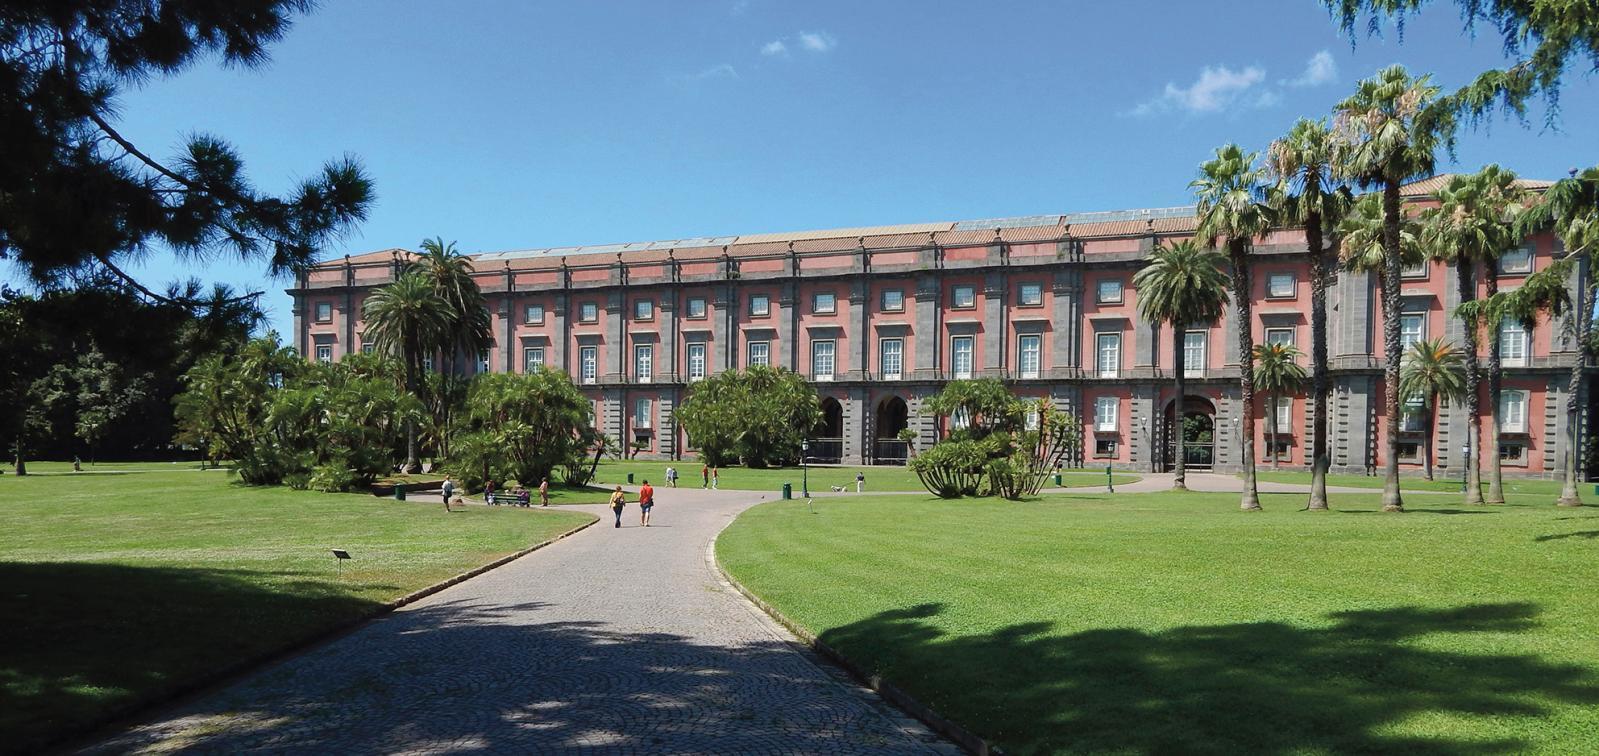 La Reggia, palais musée de Capodimonte. © Salvatore Terrano